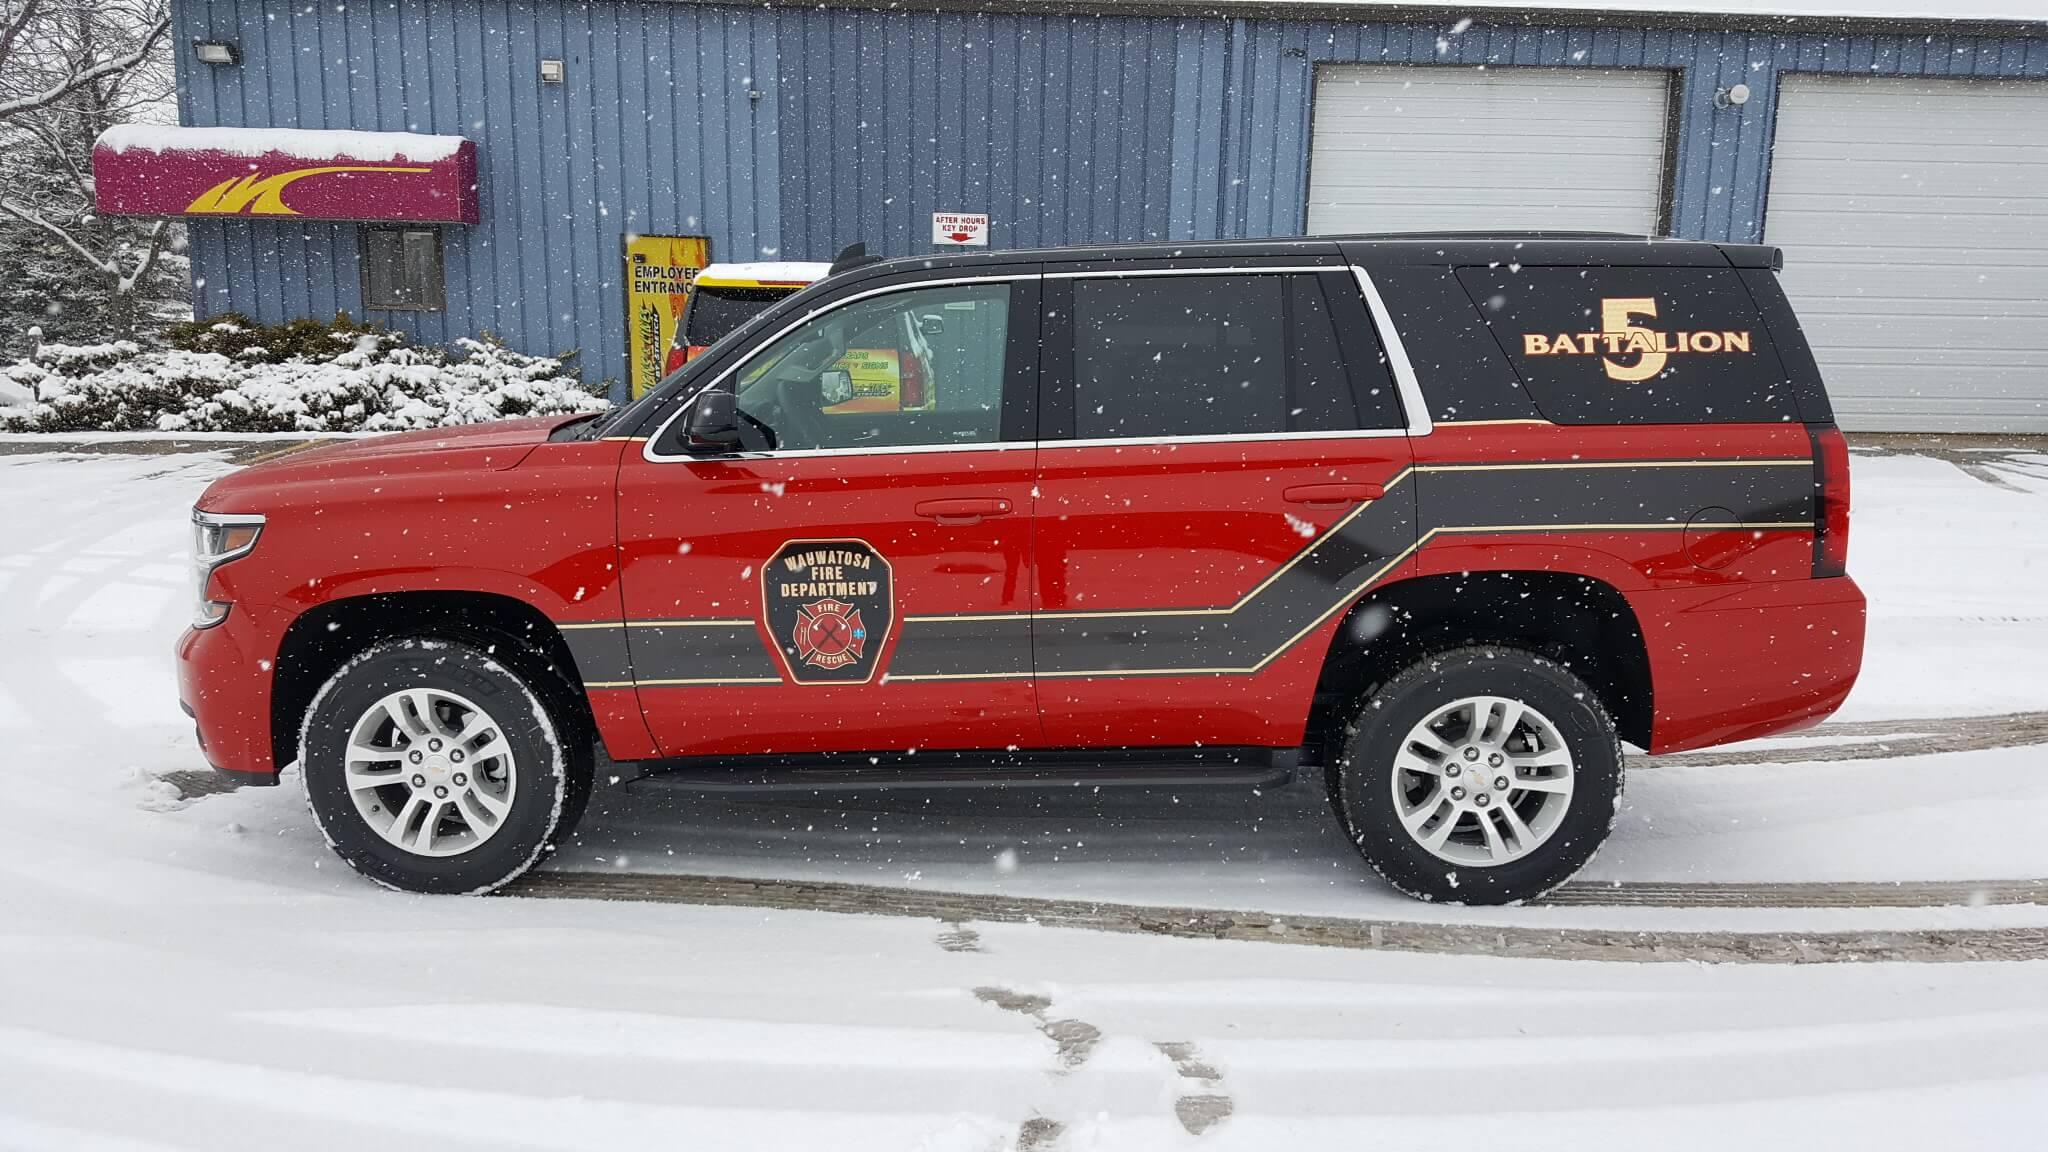 Wauwatosa Fire department decals